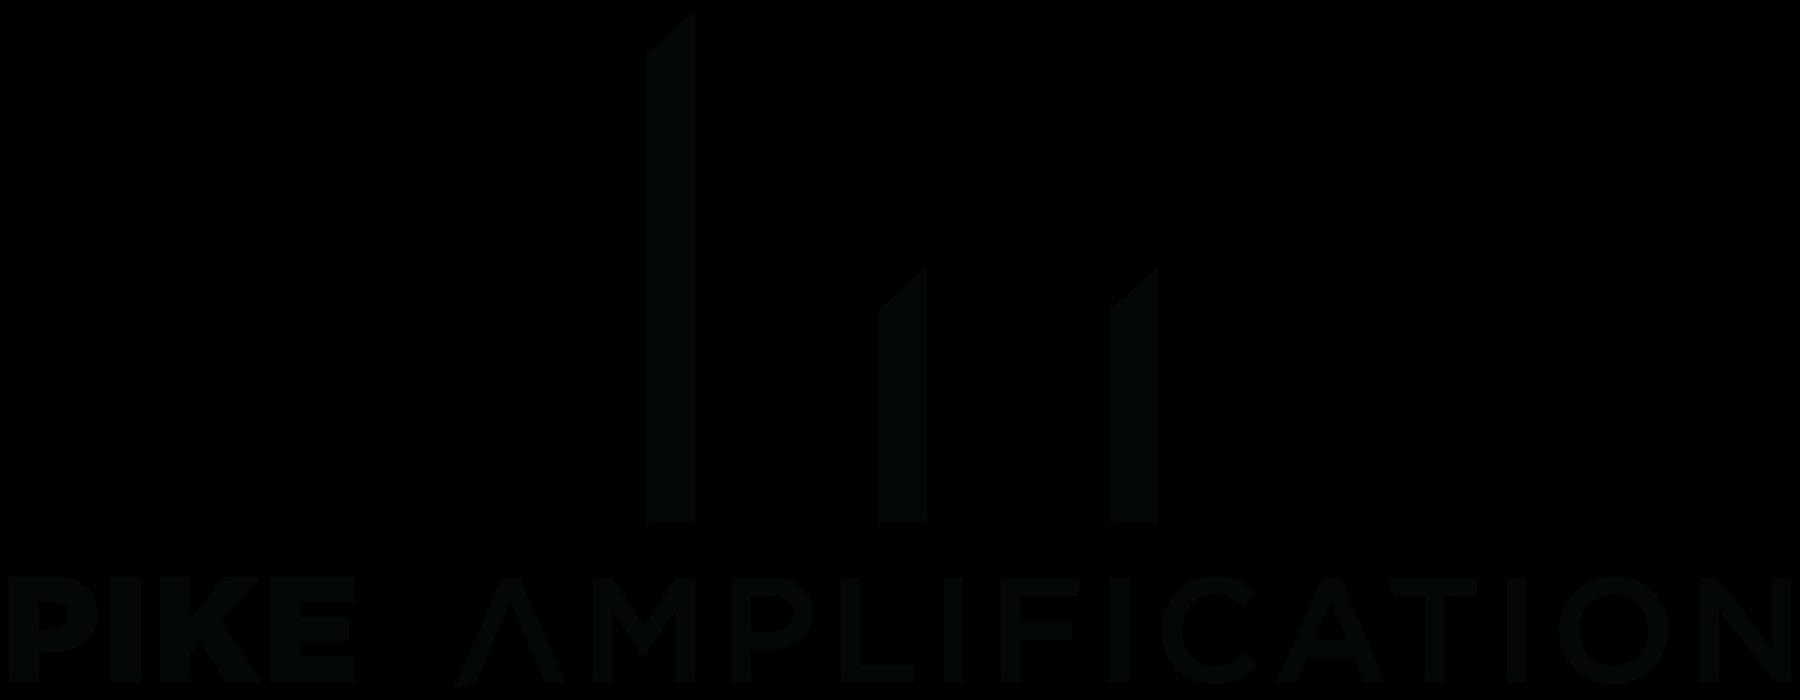 Pike_Amp_Logo_Black.png